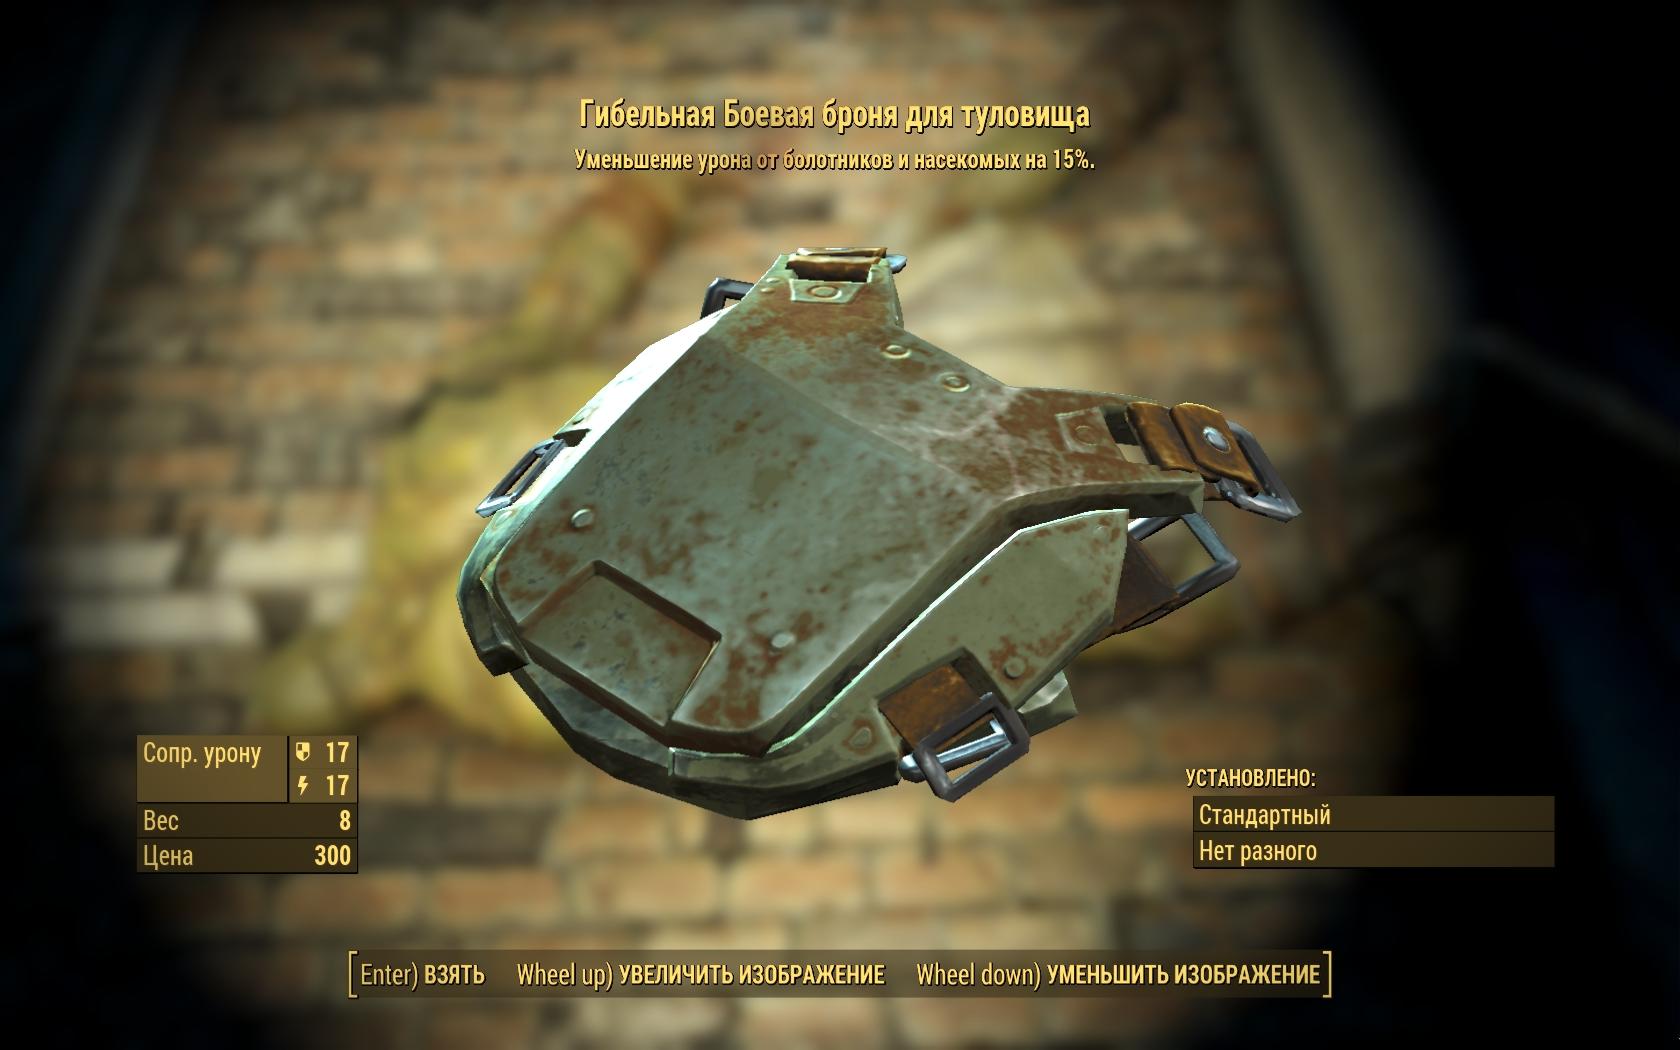 Гибельная боевая броня для туловища - Fallout 4 броня, Одежда